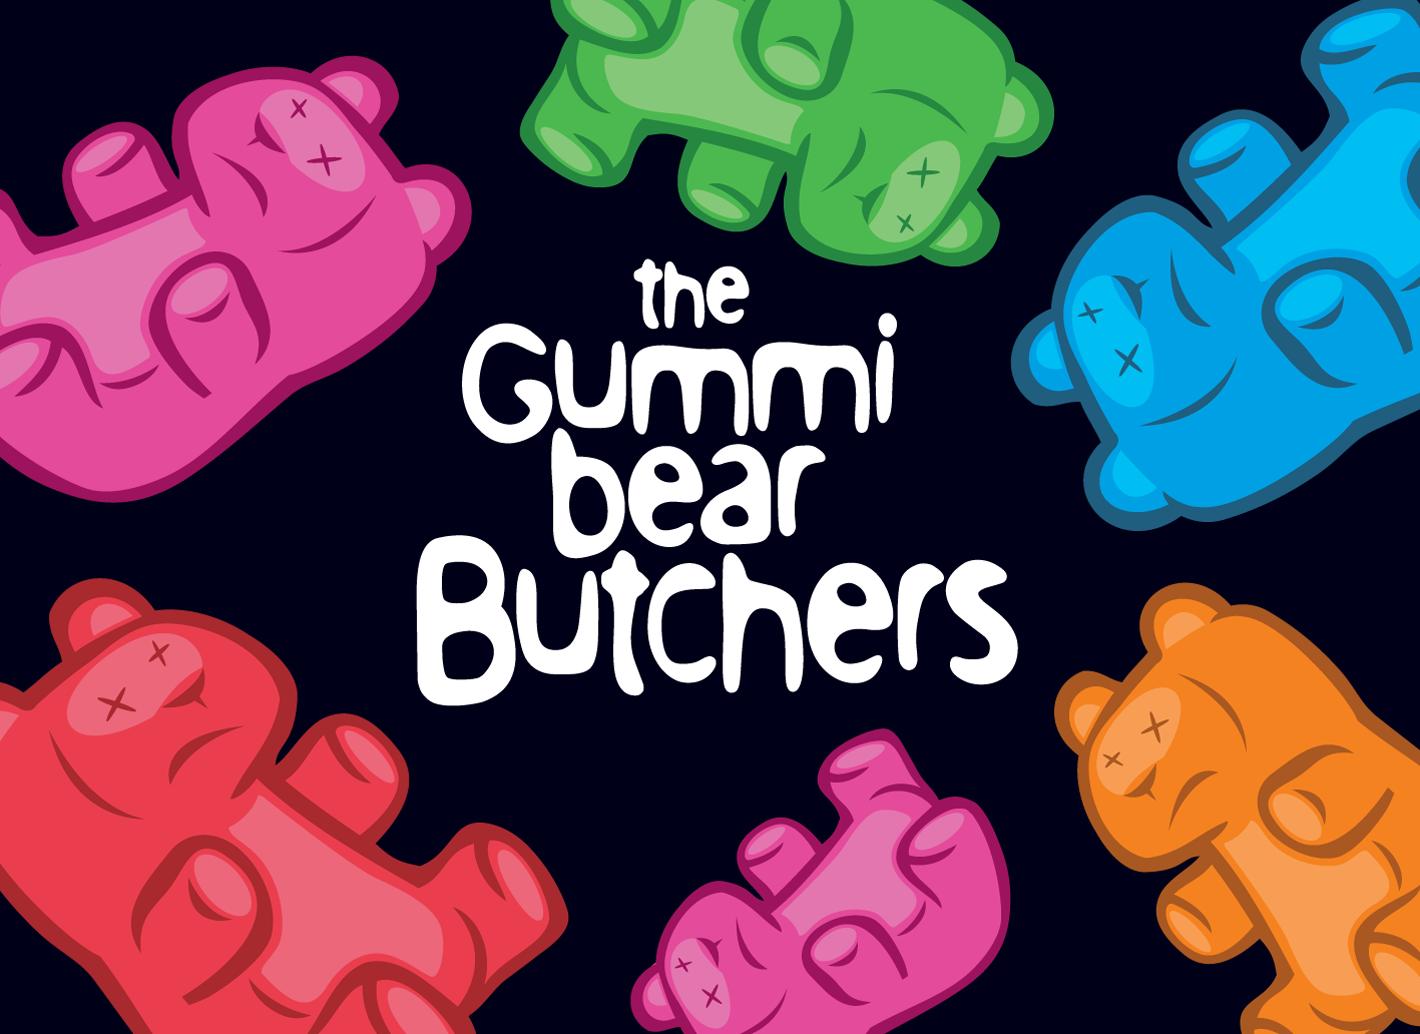 Gummi Bear Butchers logo omringd door gekleurde gummi beren